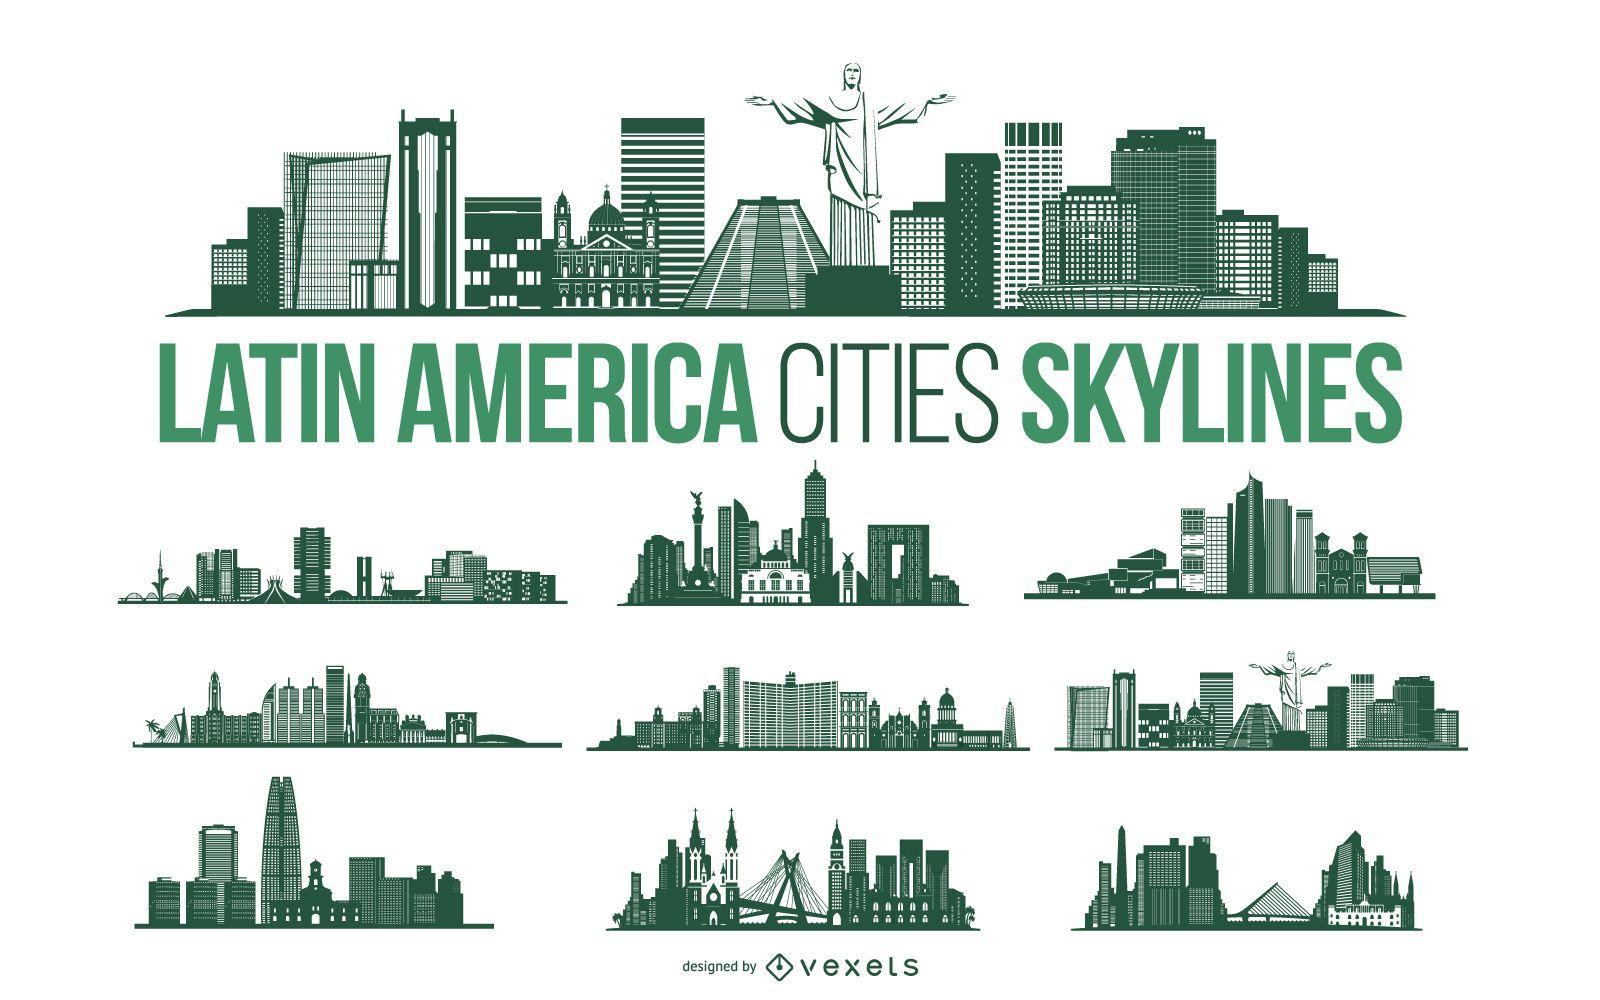 Latin America City Skyline Pack